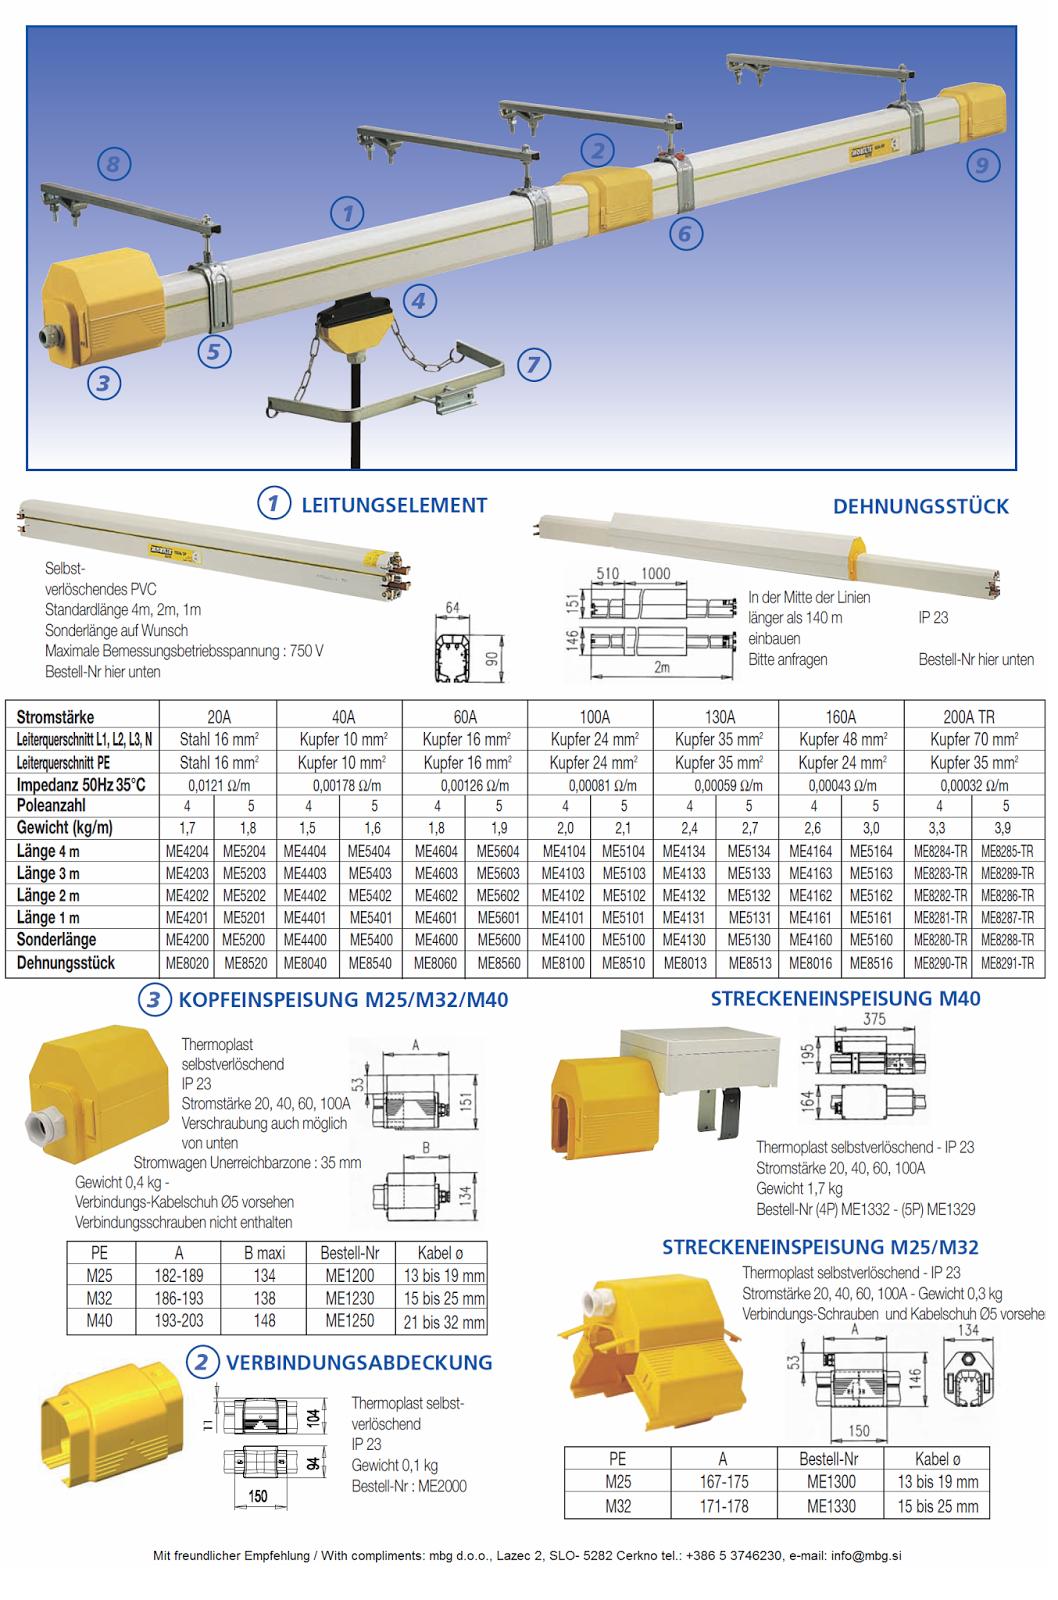 Električni drsni vodi - Elektrische Kontakte und Stromschienen - Electrics contacts and rails